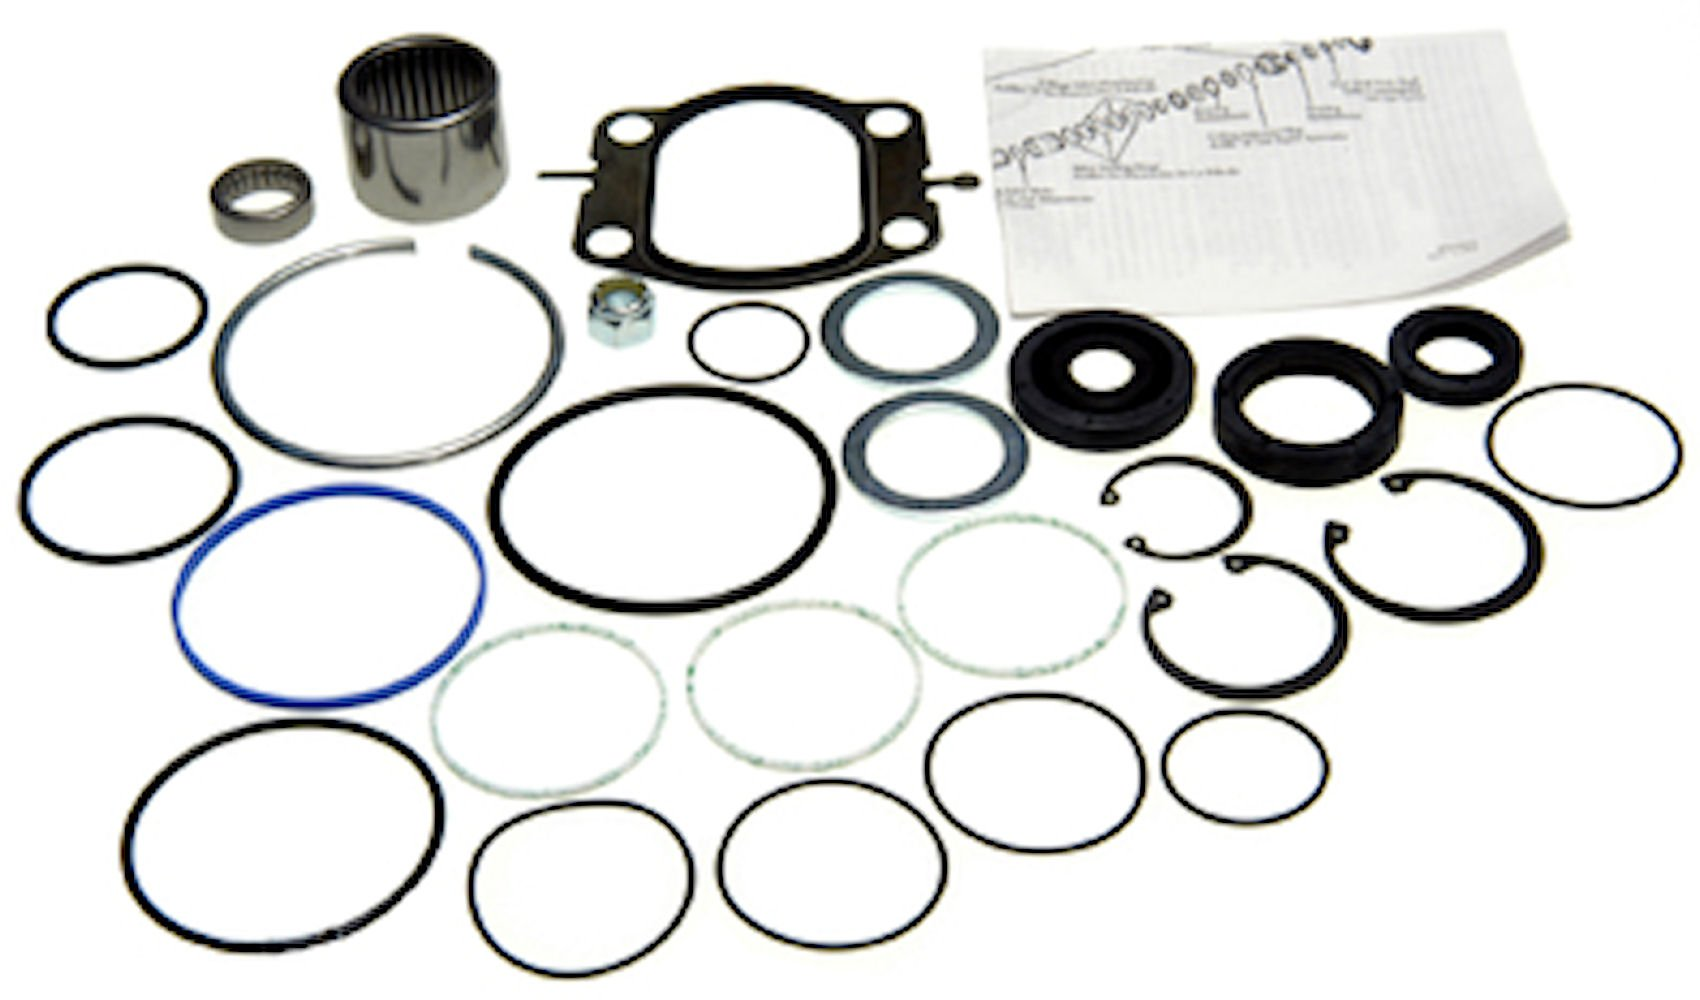 Edelmann 8522 Power Steering Gear Box Complete Rebuild 2004 Ford F 250 Super Duty Kit Automotive